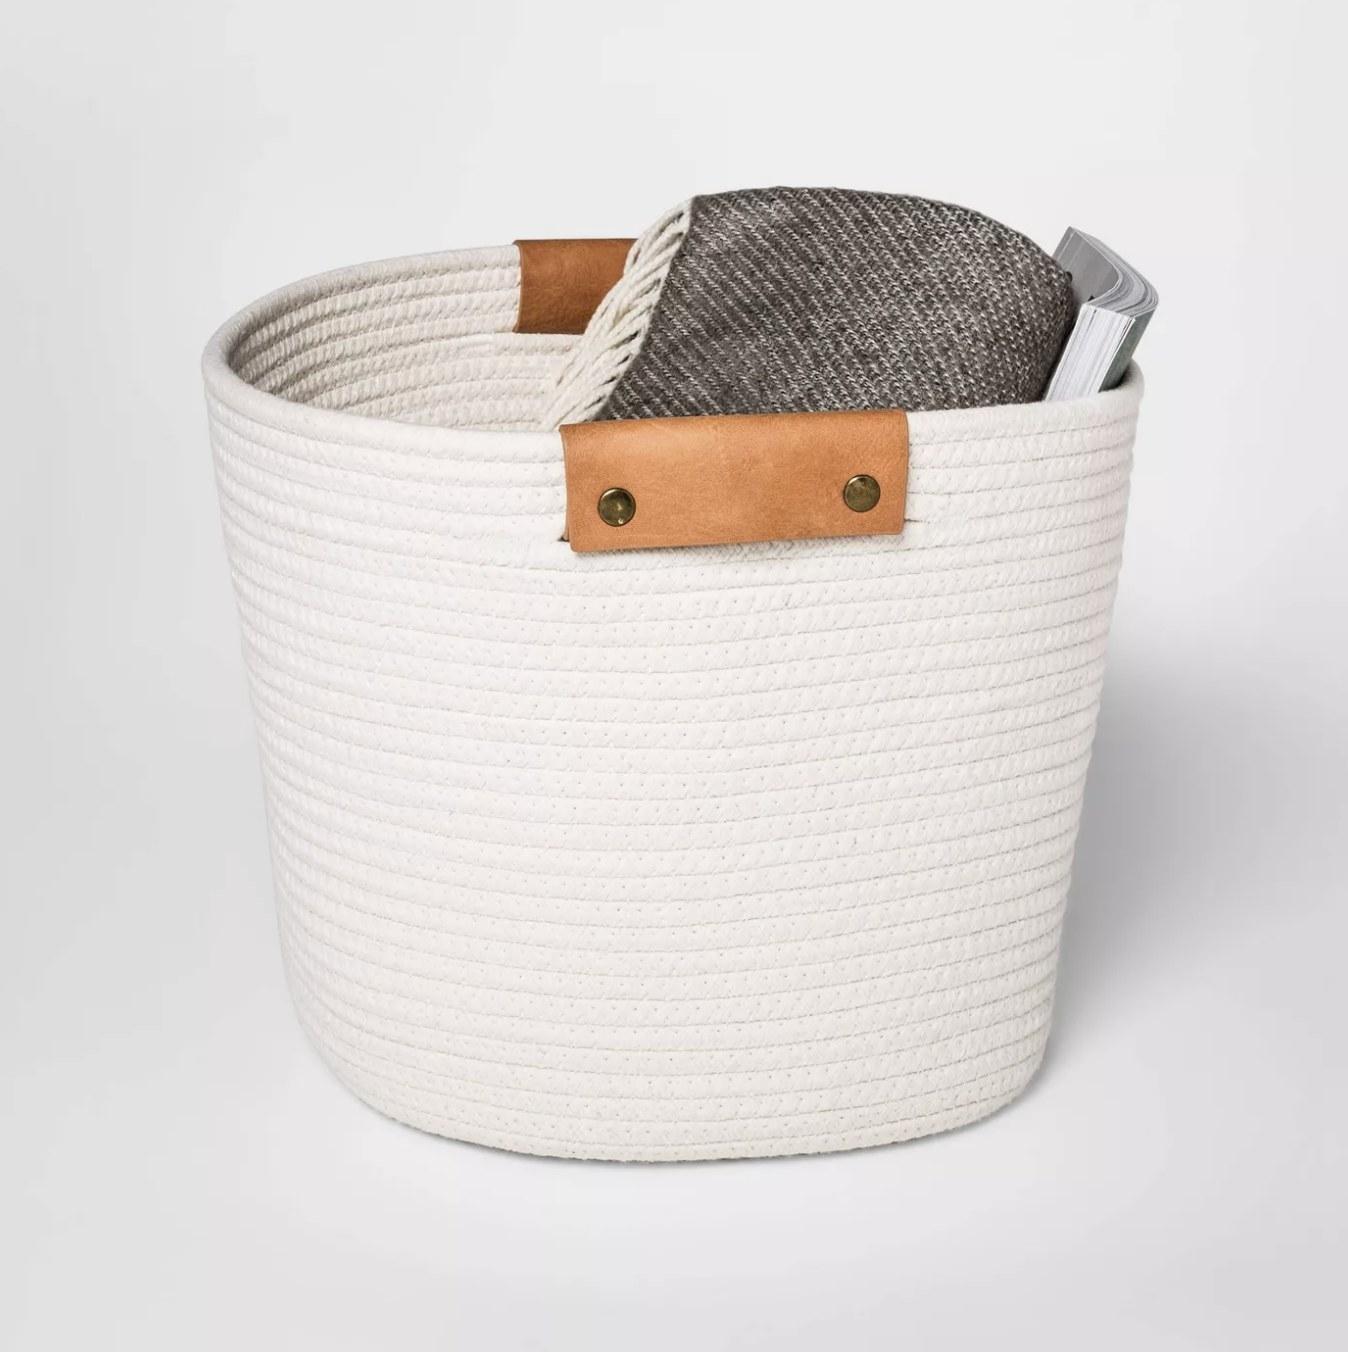 The cream colored basket